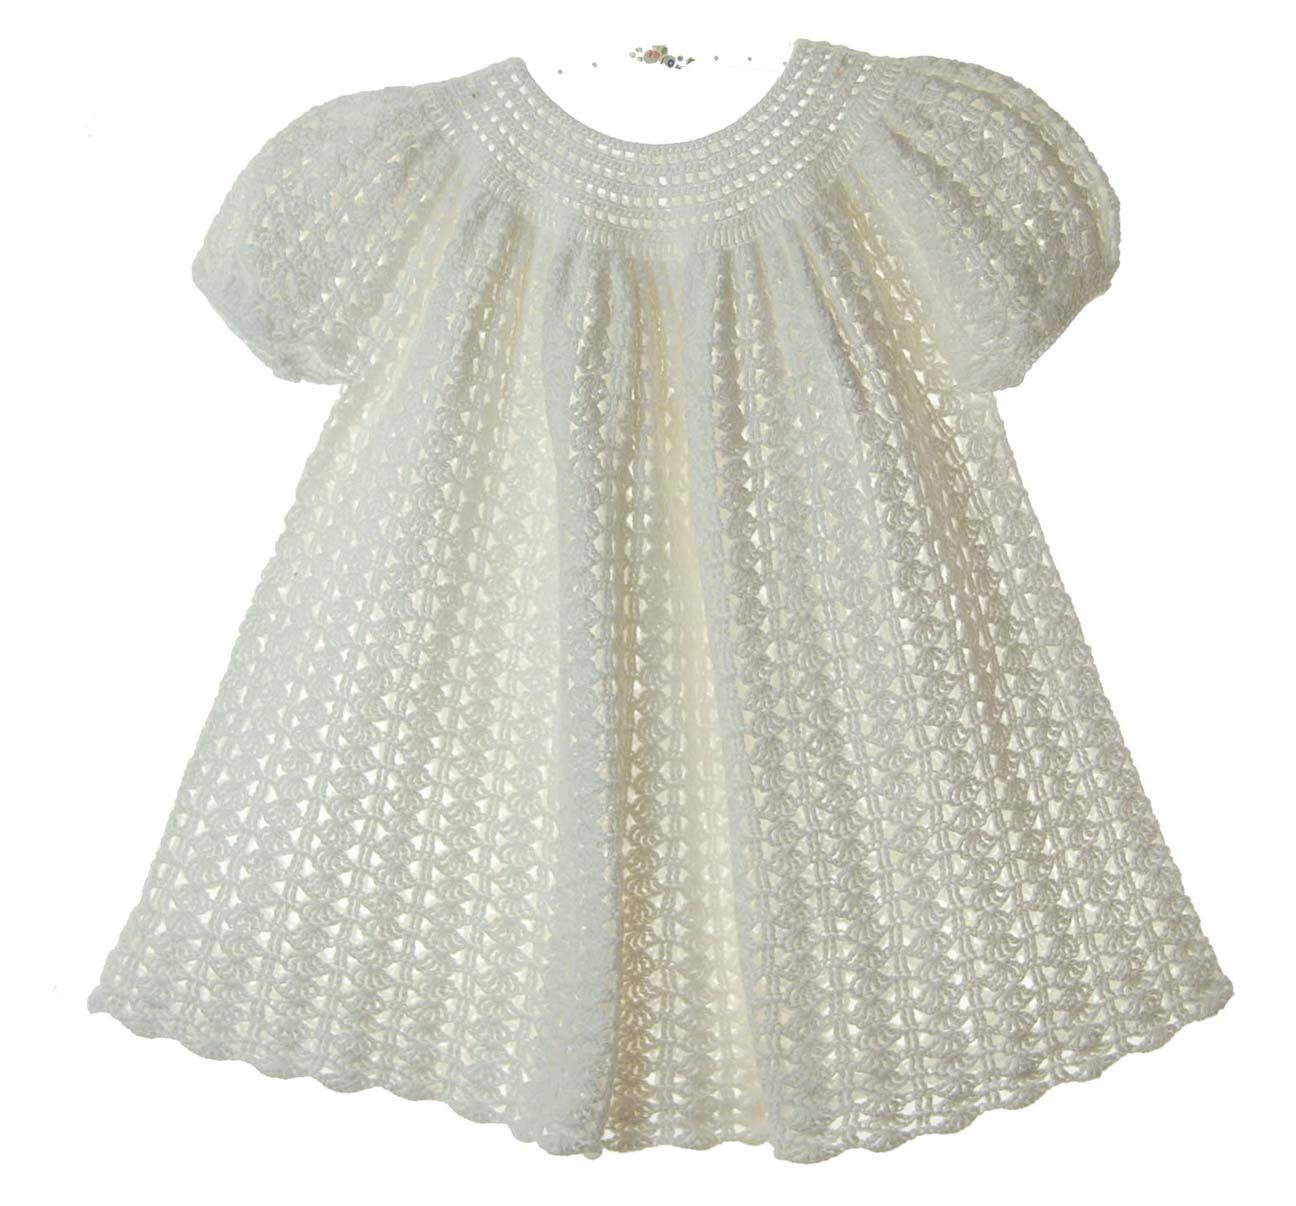 custom crocheted winter white baby dress,winter white crocheted